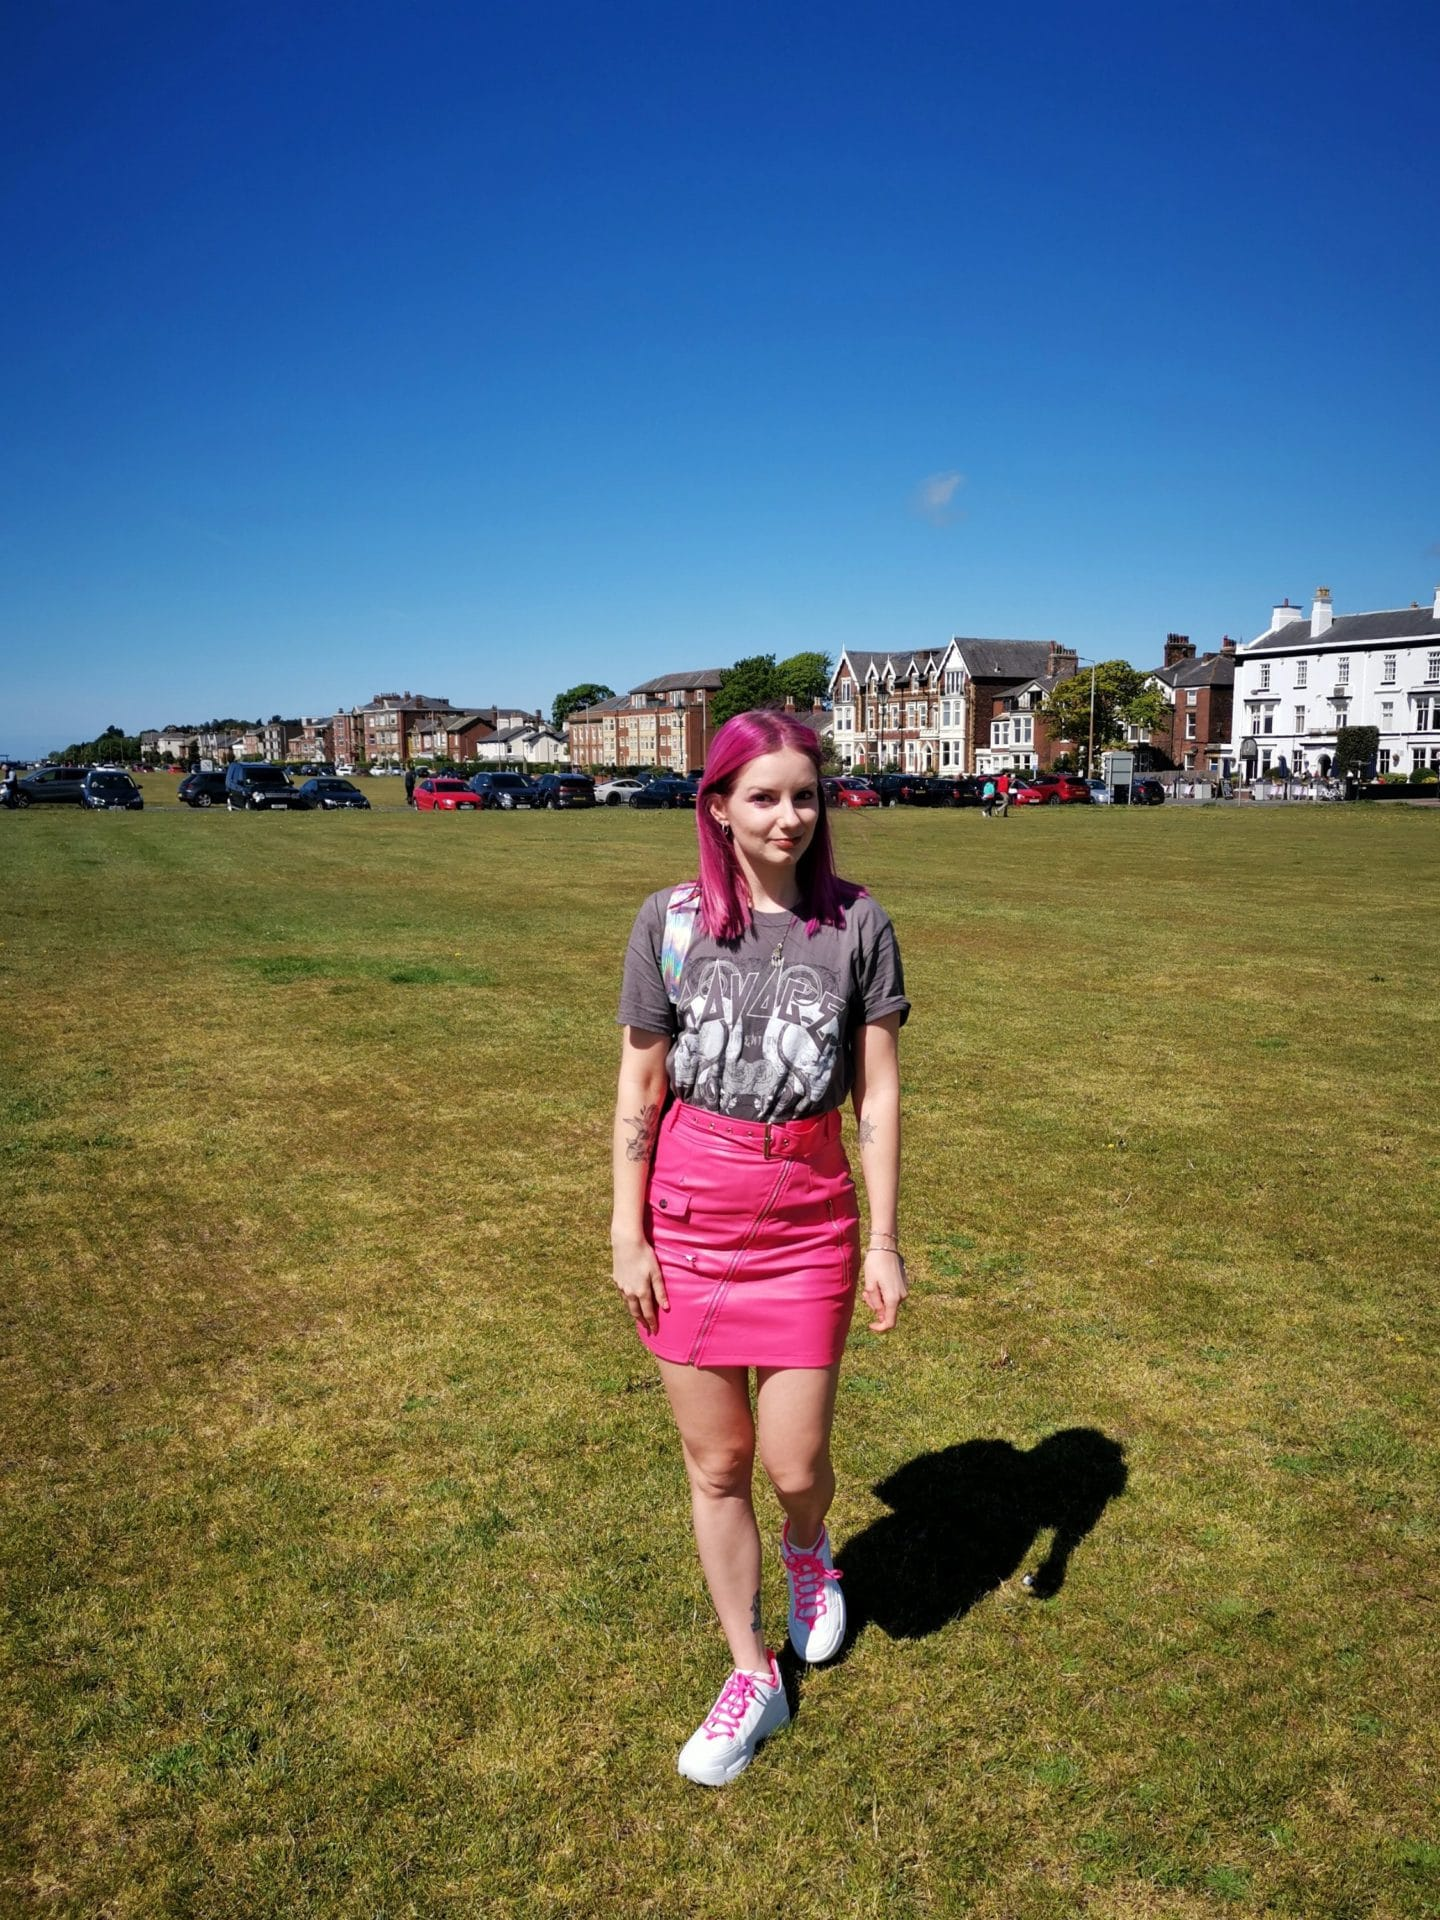 Pretty_Little_Thing_Festival_Outfit_Biker_Skirt